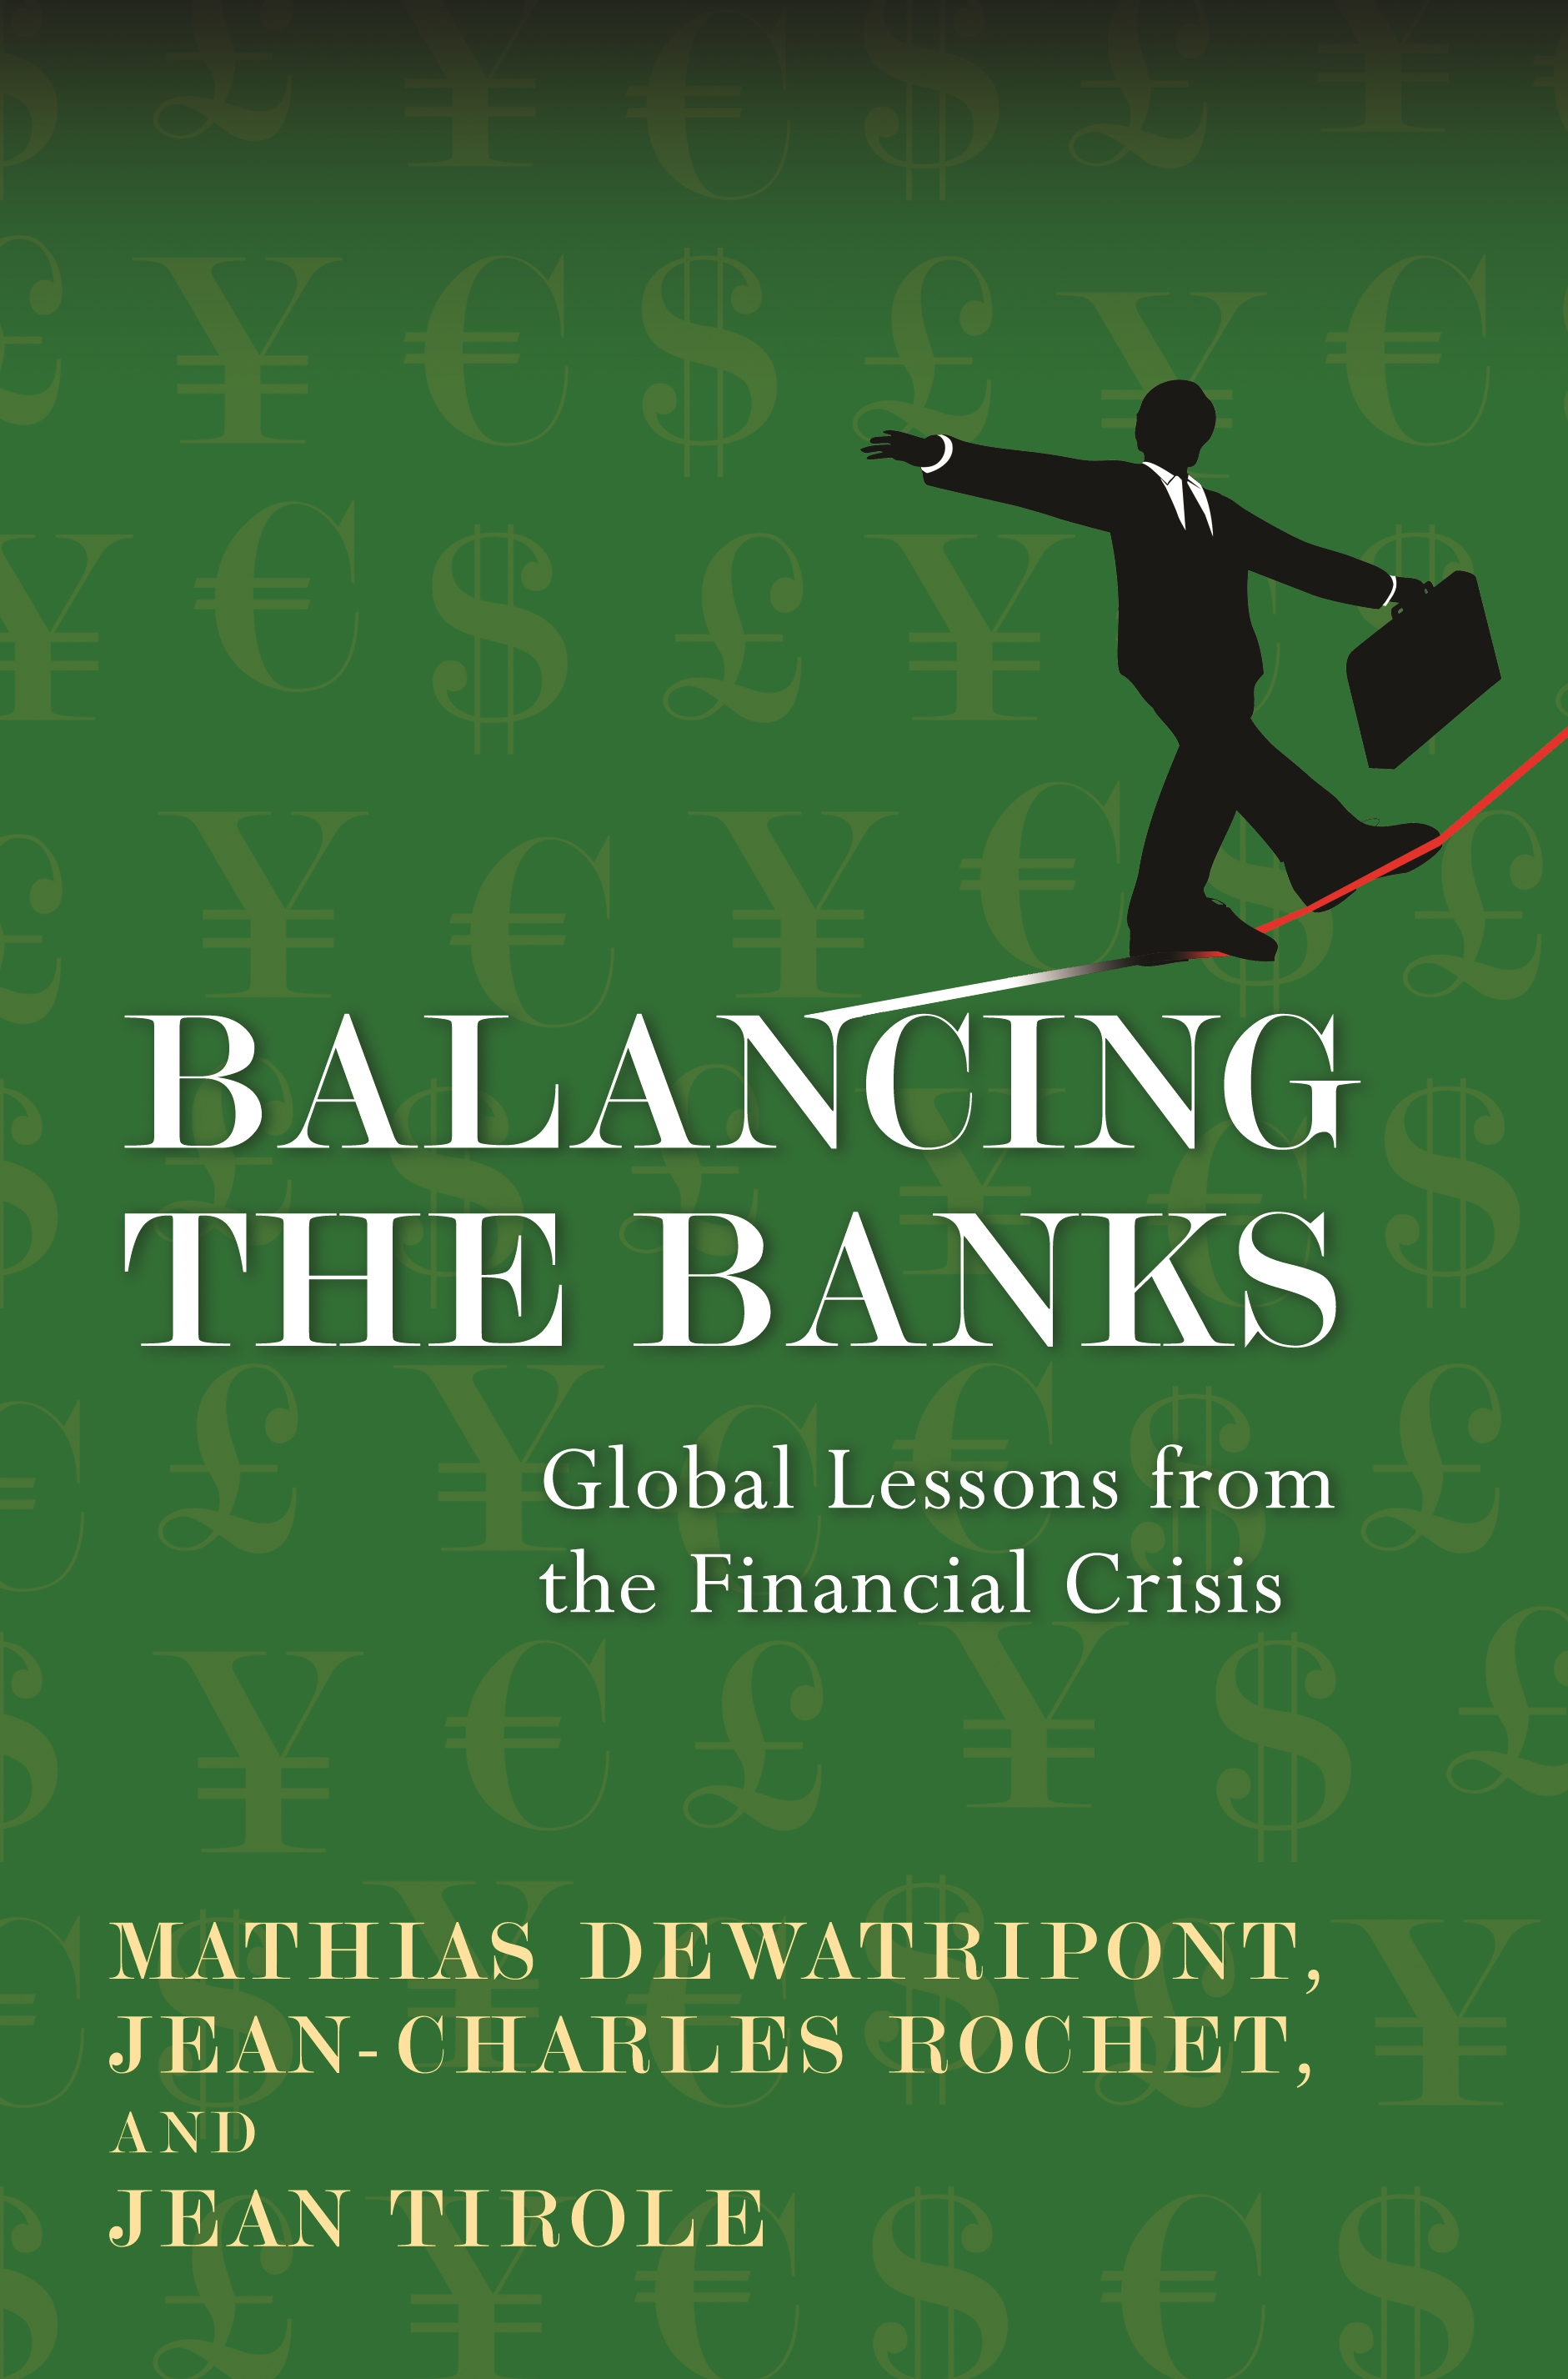 Download Ebook Balancing the Banks by Mathias Dewatripont Pdf